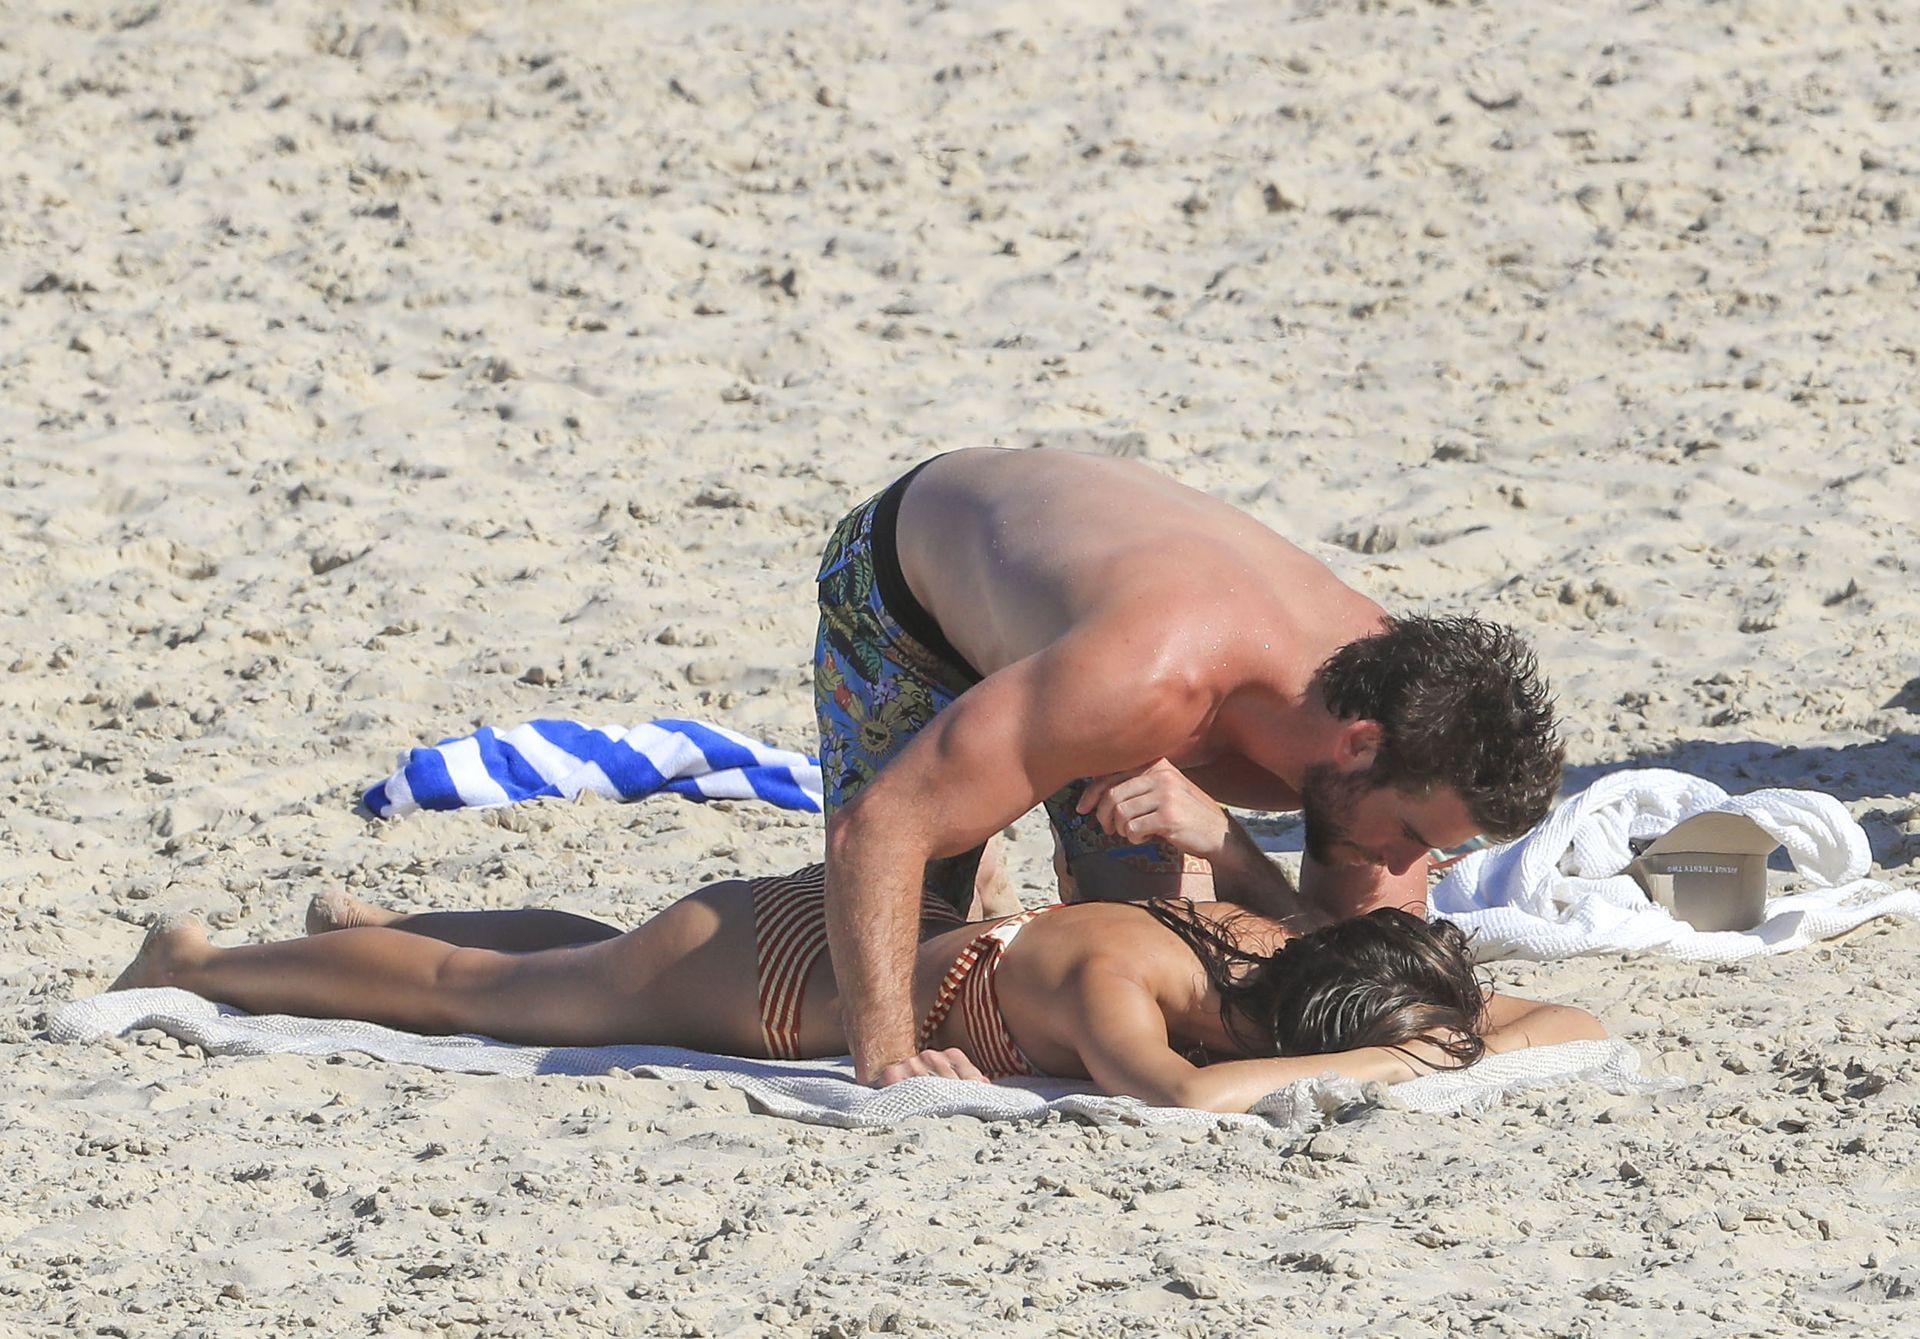 Gabriella Brooks Hot – Liam Hemsworth's New Girlfriend 0021